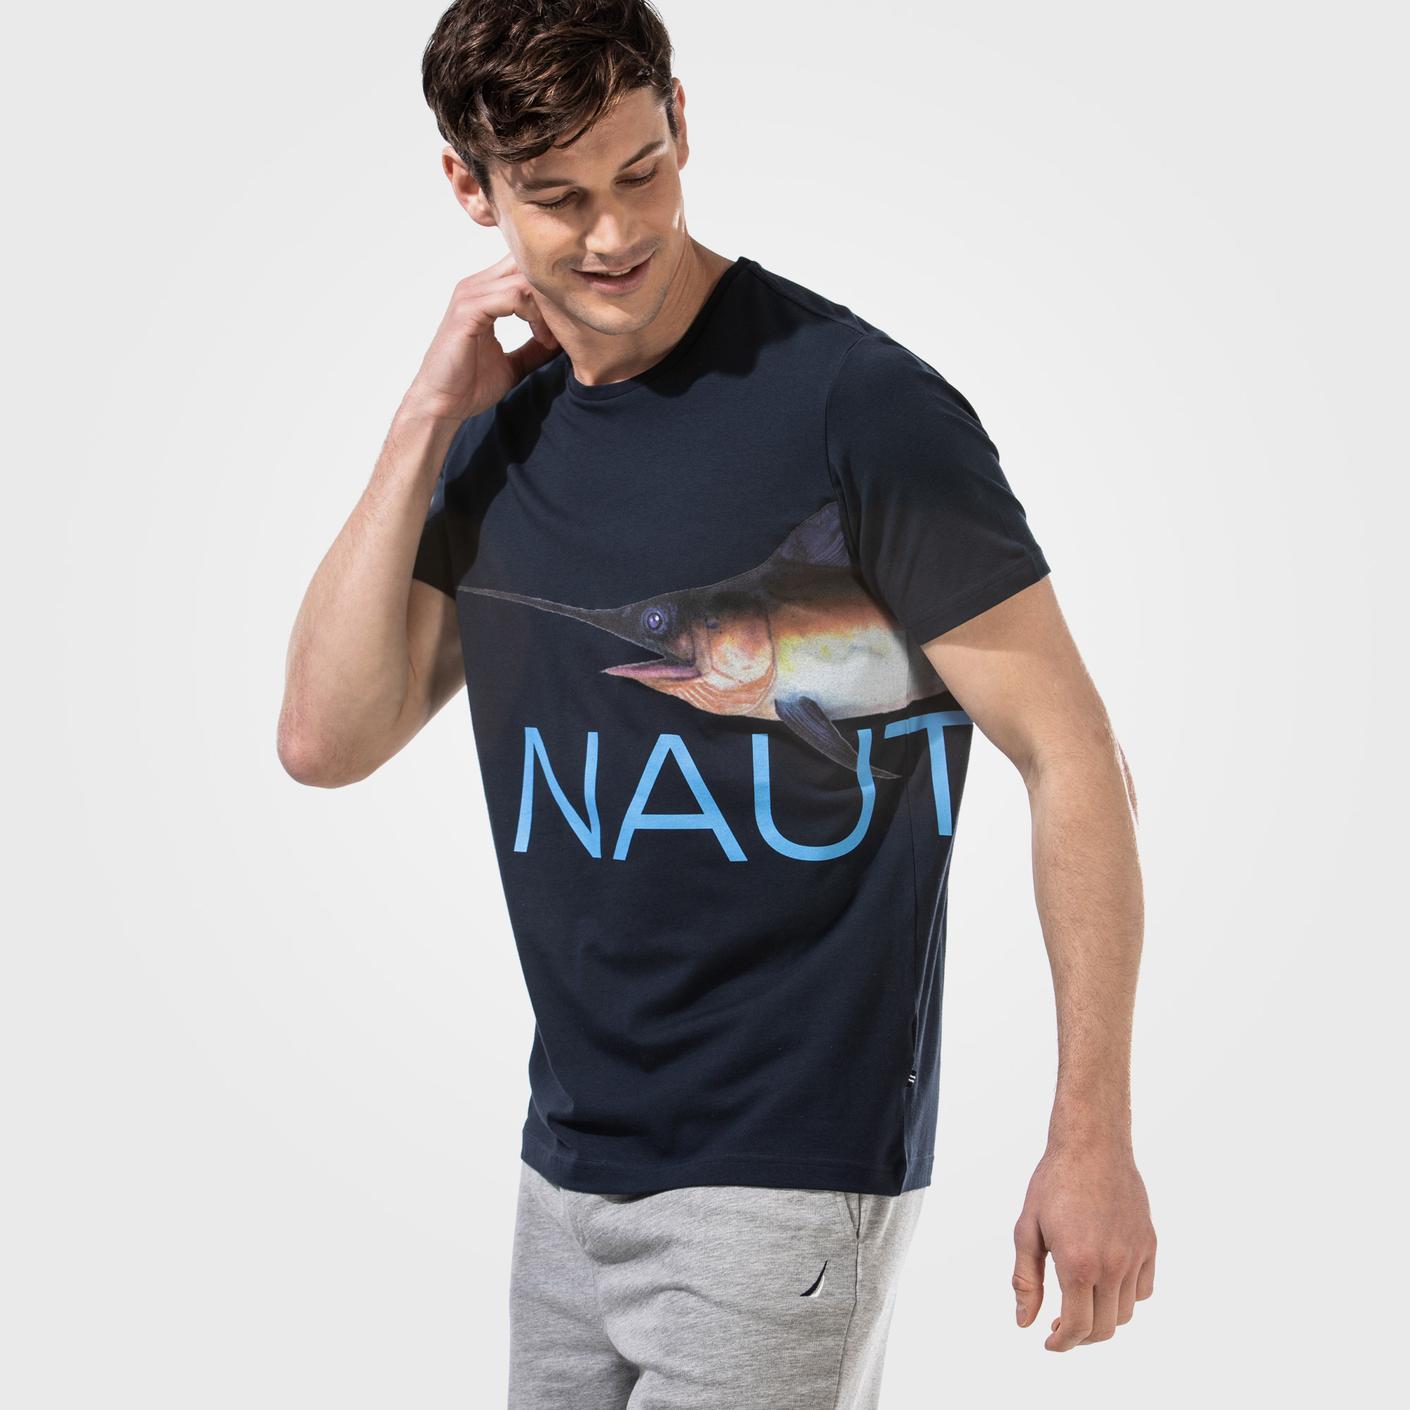 NAUTICA ERKEK LACİVERT T-SHIRT